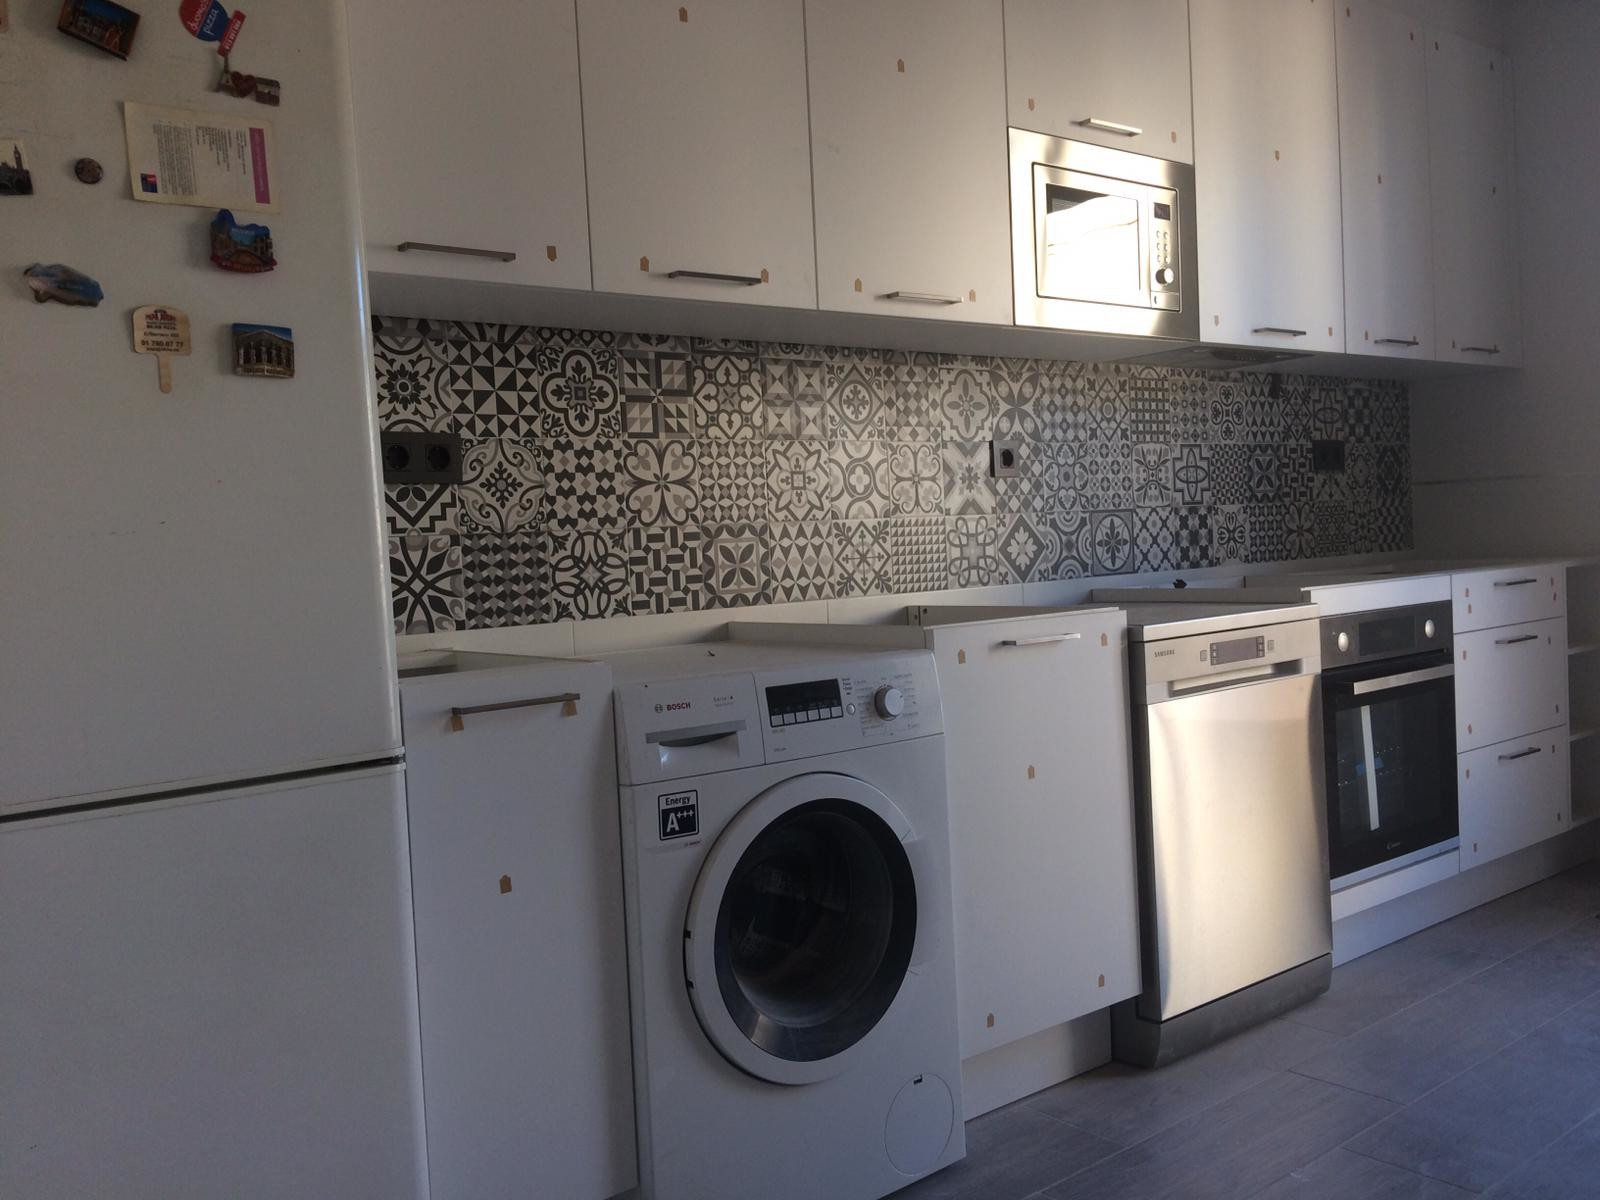 room-rental-madrid-9202798765cc04c0229bbfcf7c85fe88